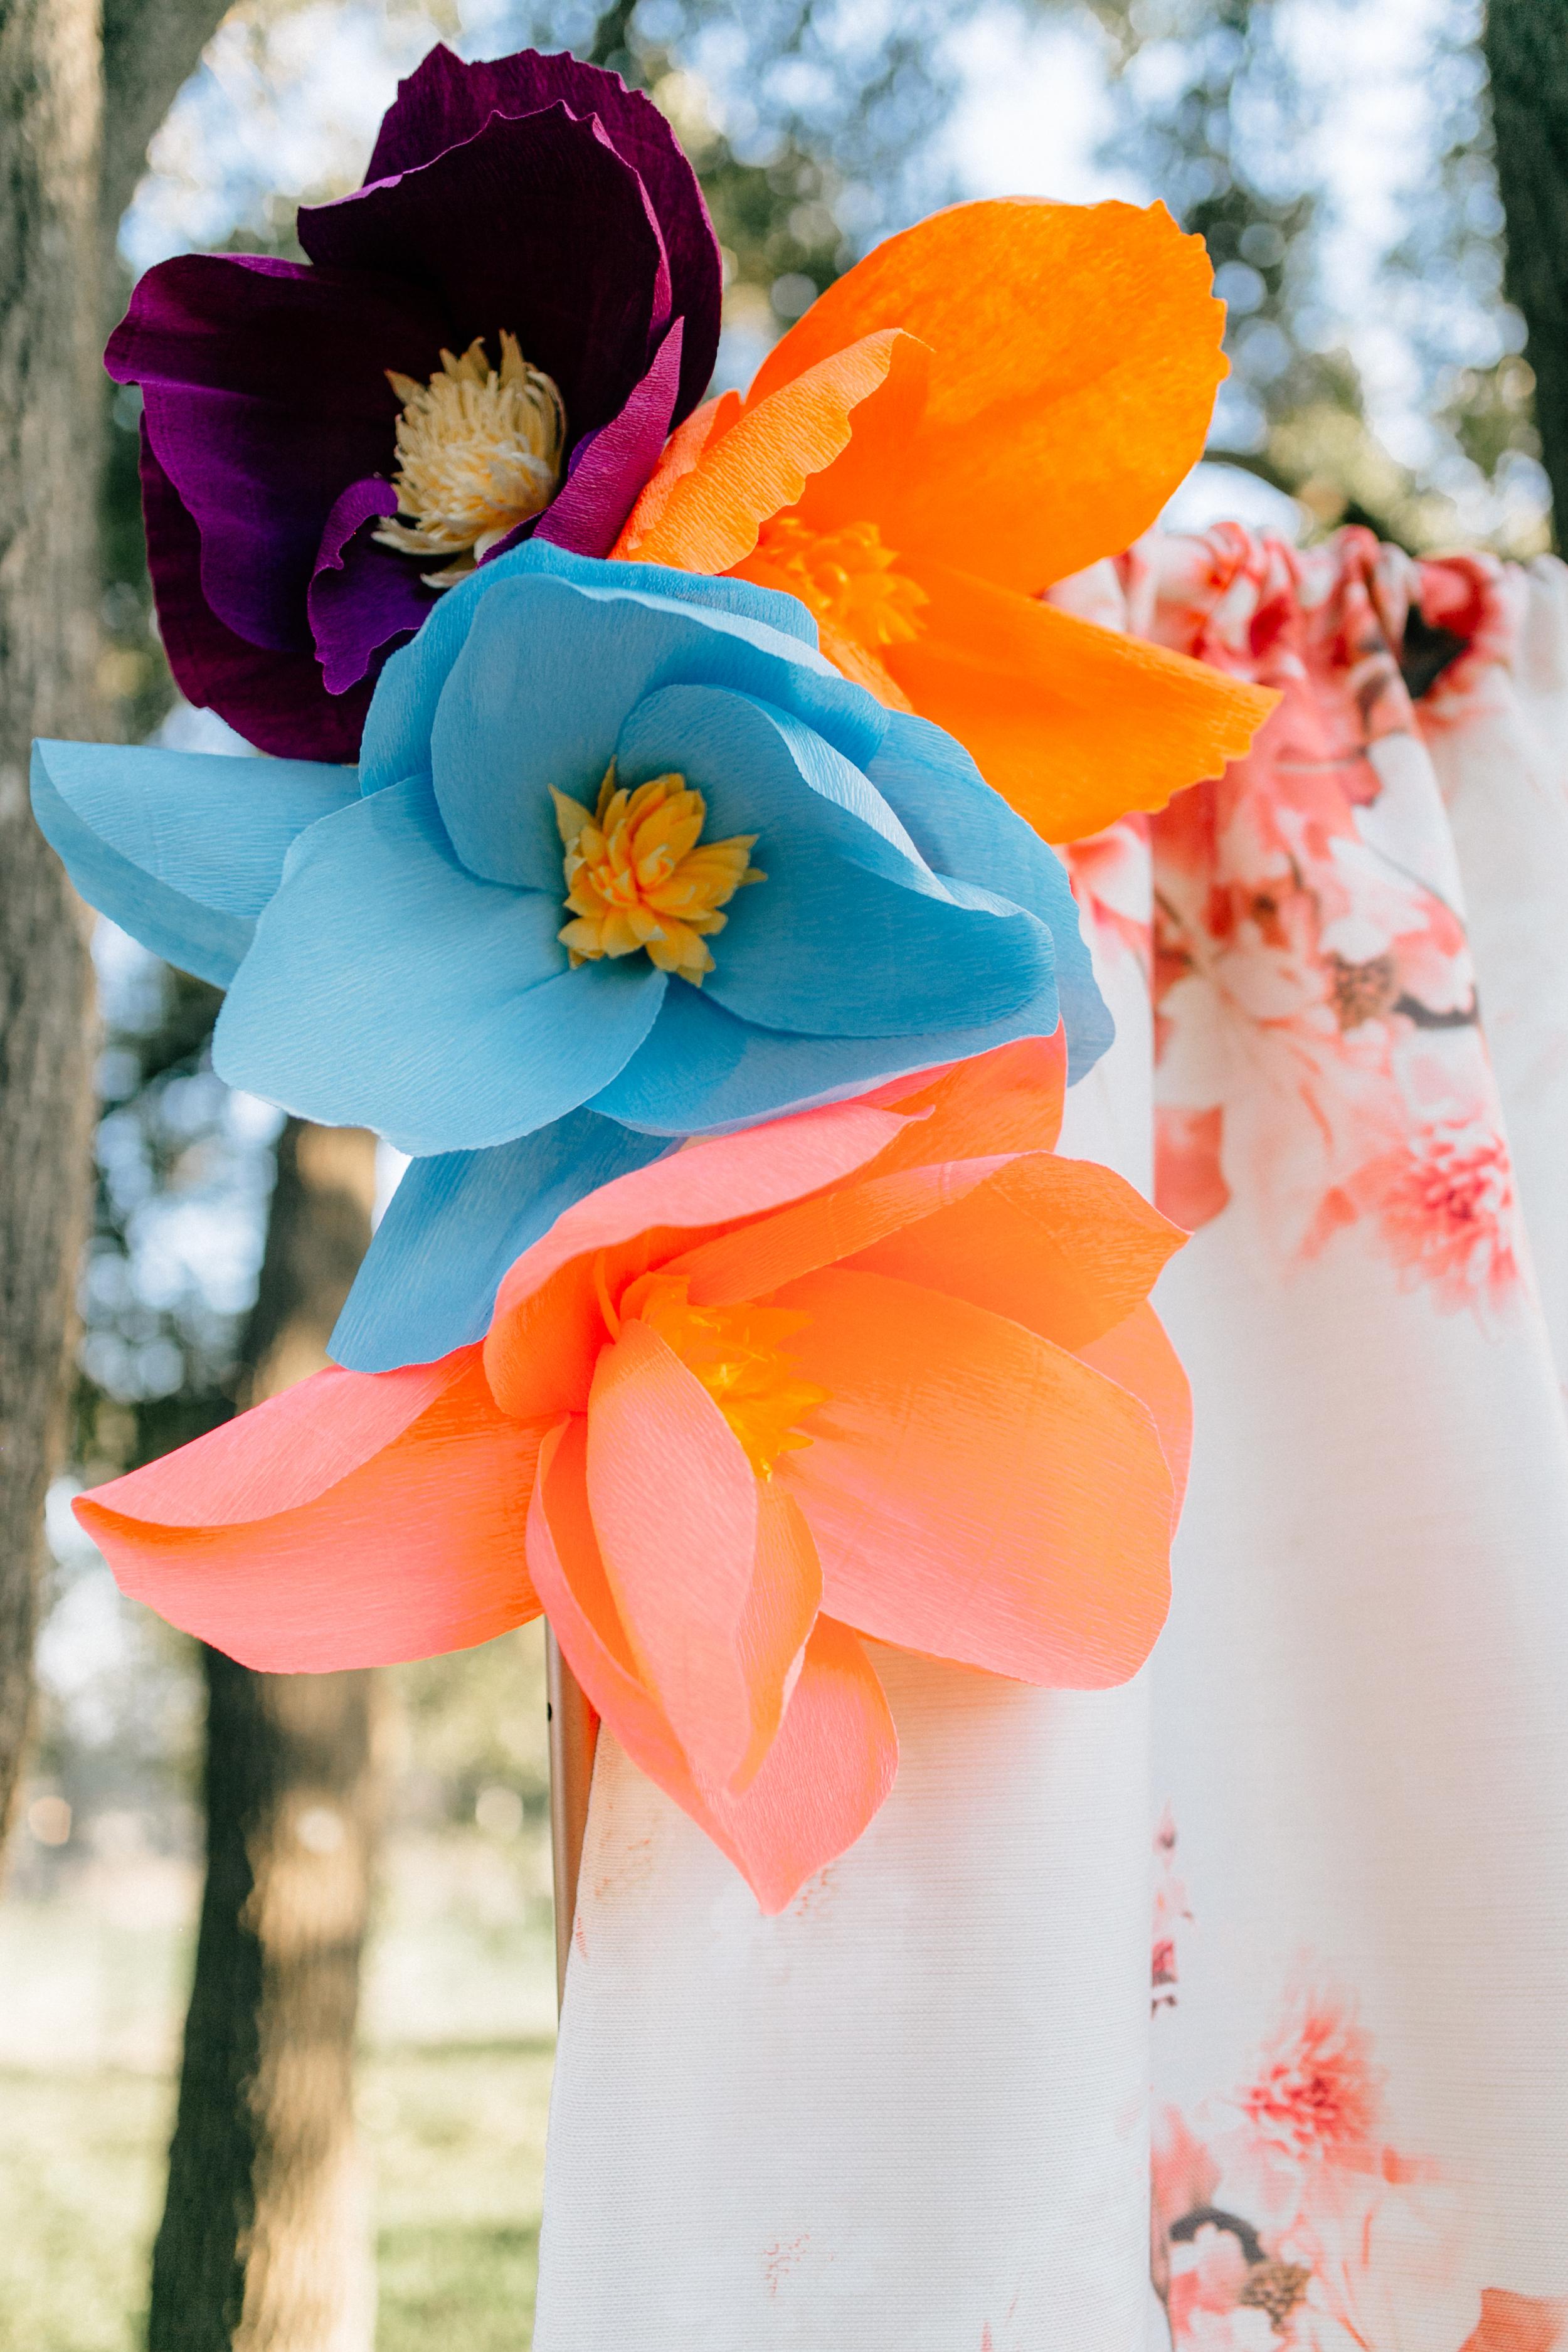 austin wedding floral backdrop rental